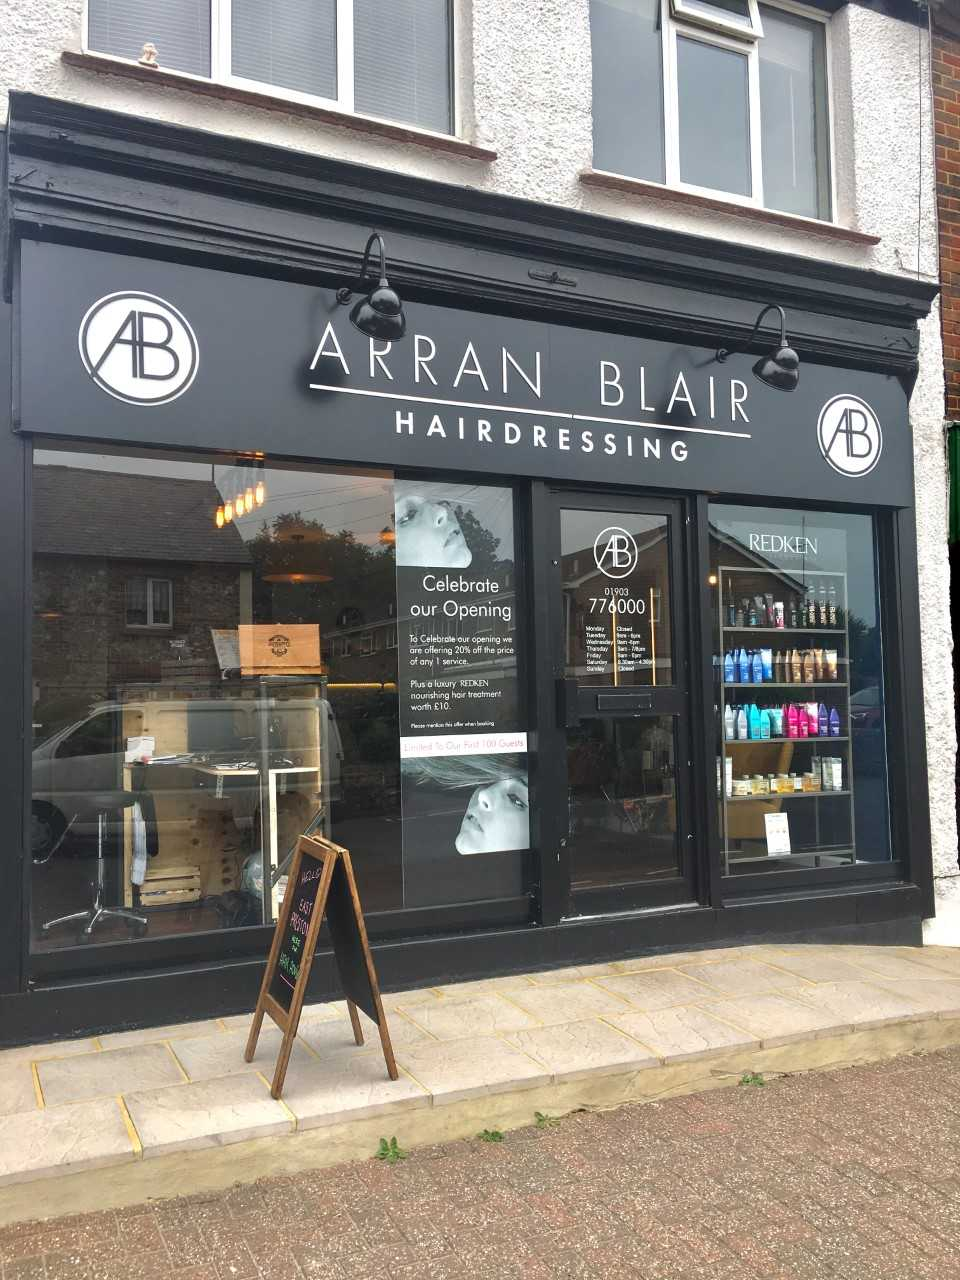 Arran Blair in East Preston